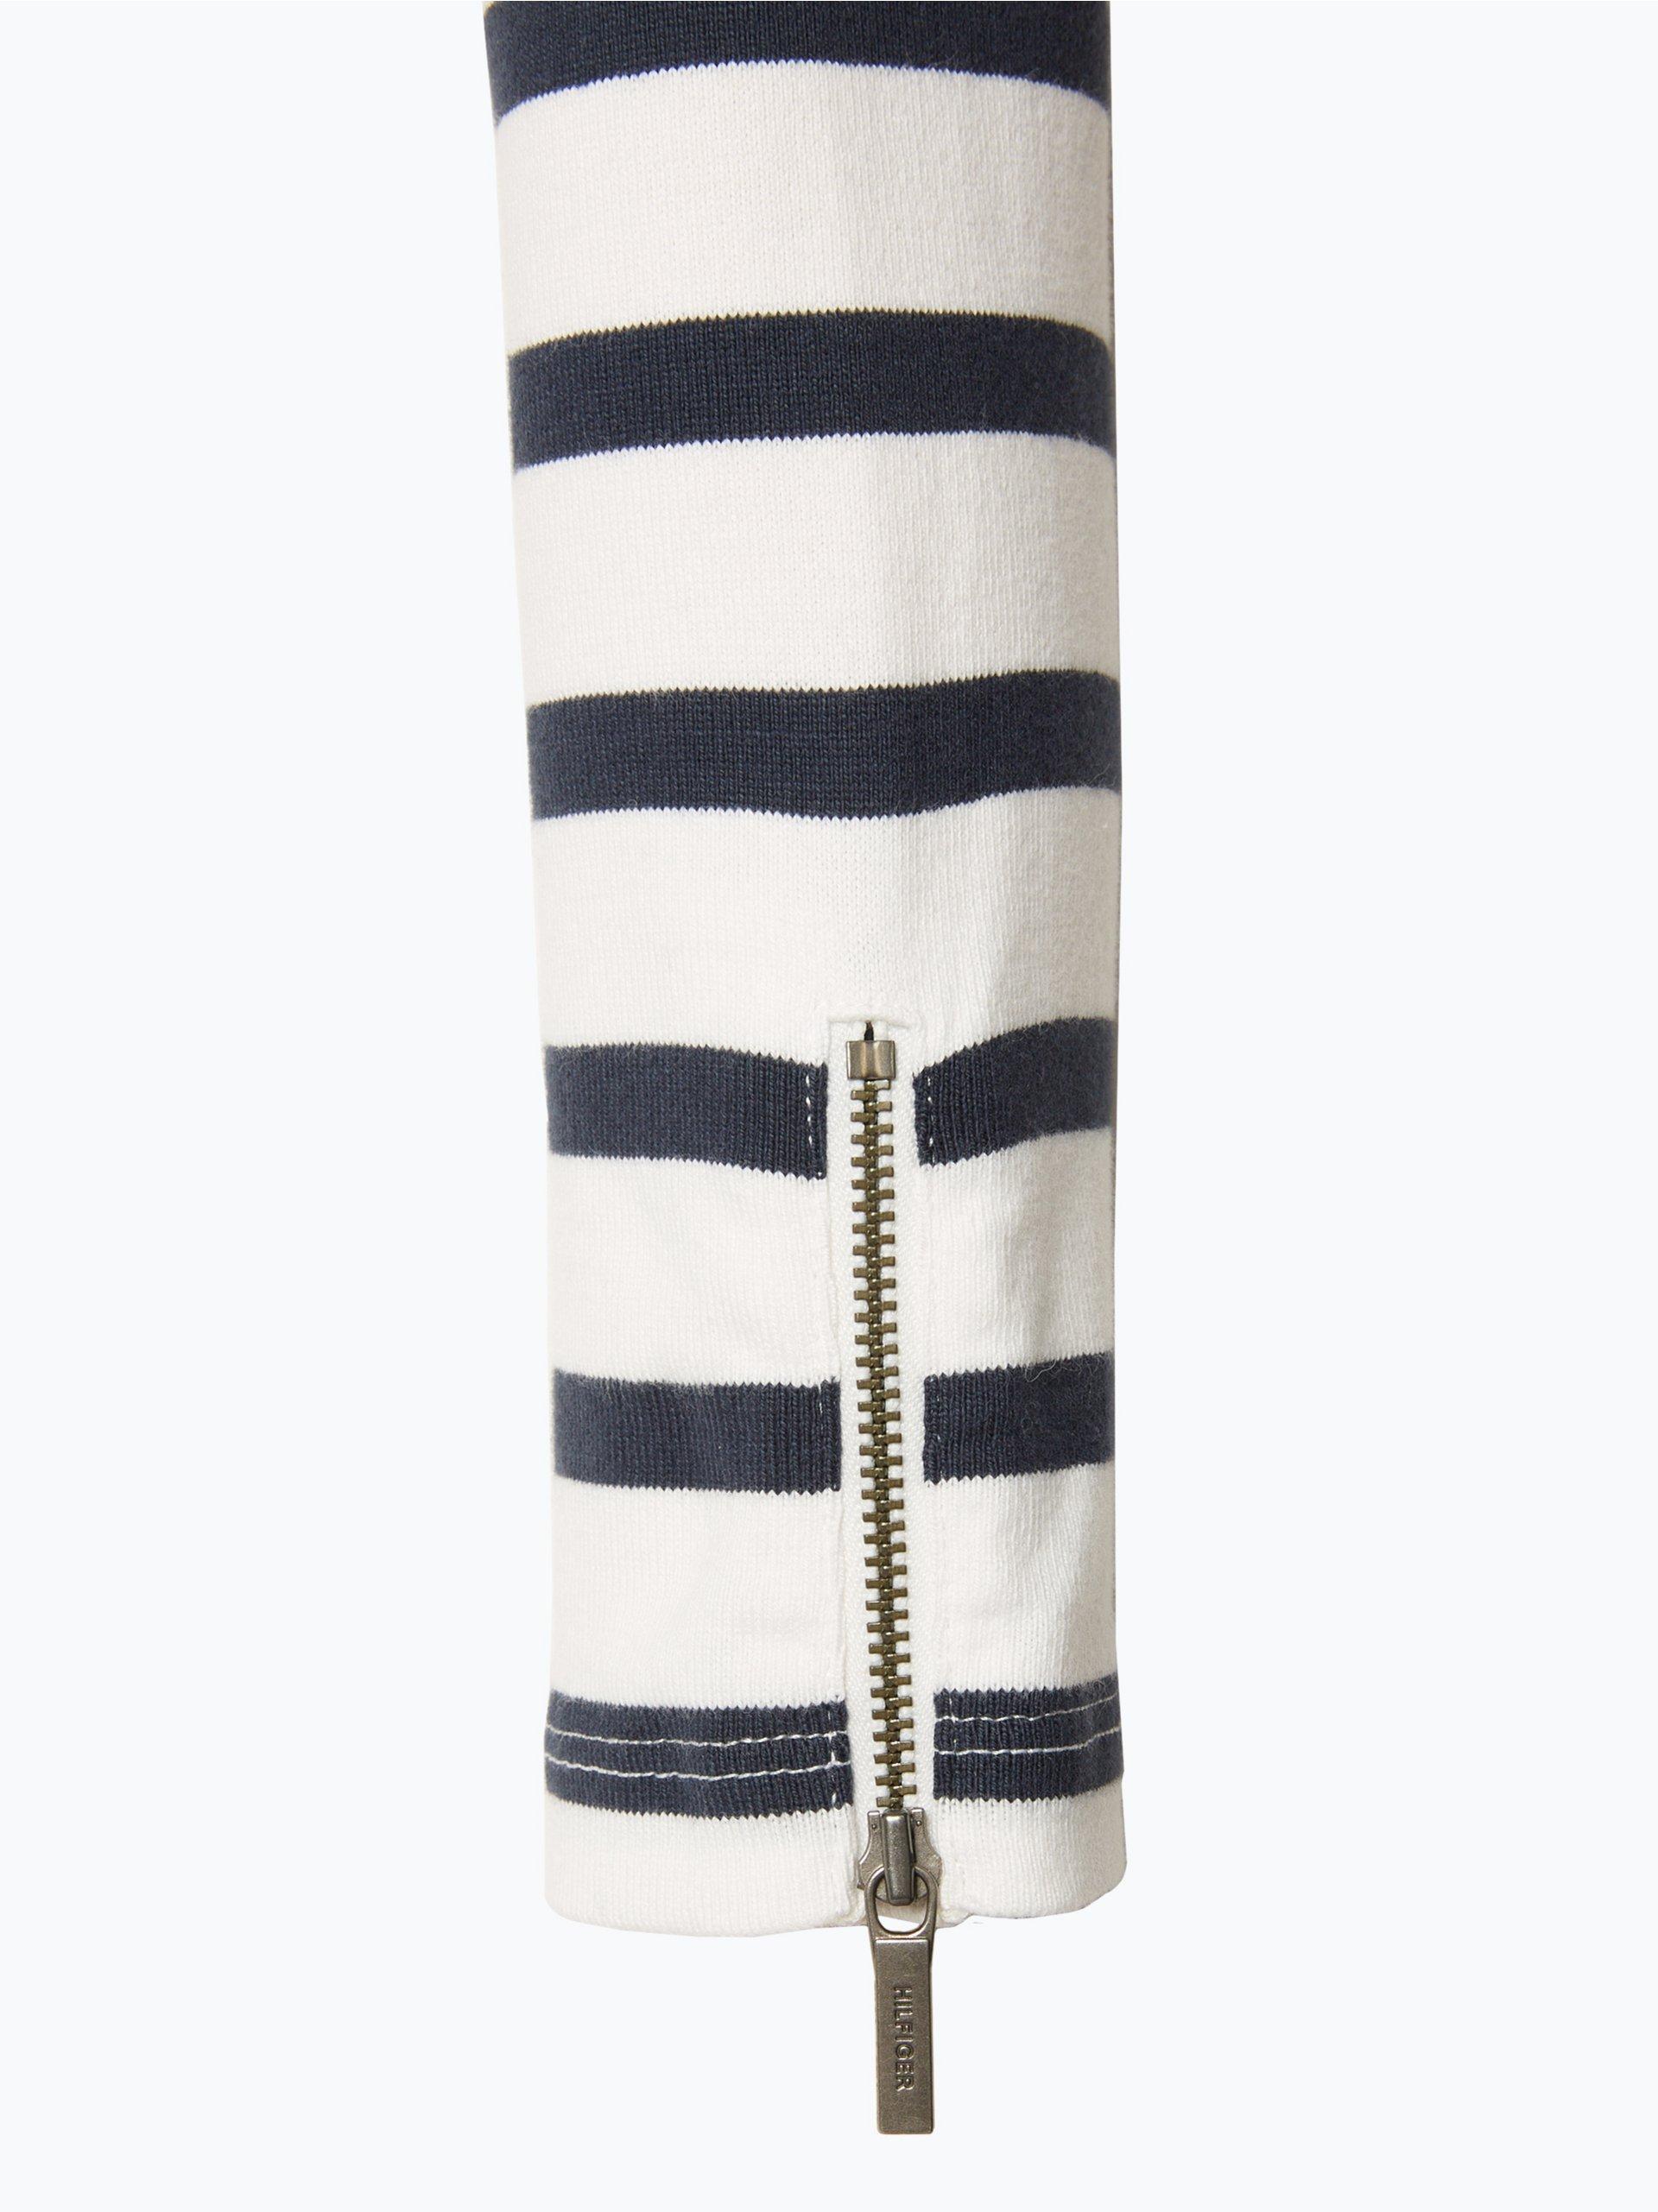 tommy hilfiger damen sweatshirt olinda wei gestreift. Black Bedroom Furniture Sets. Home Design Ideas